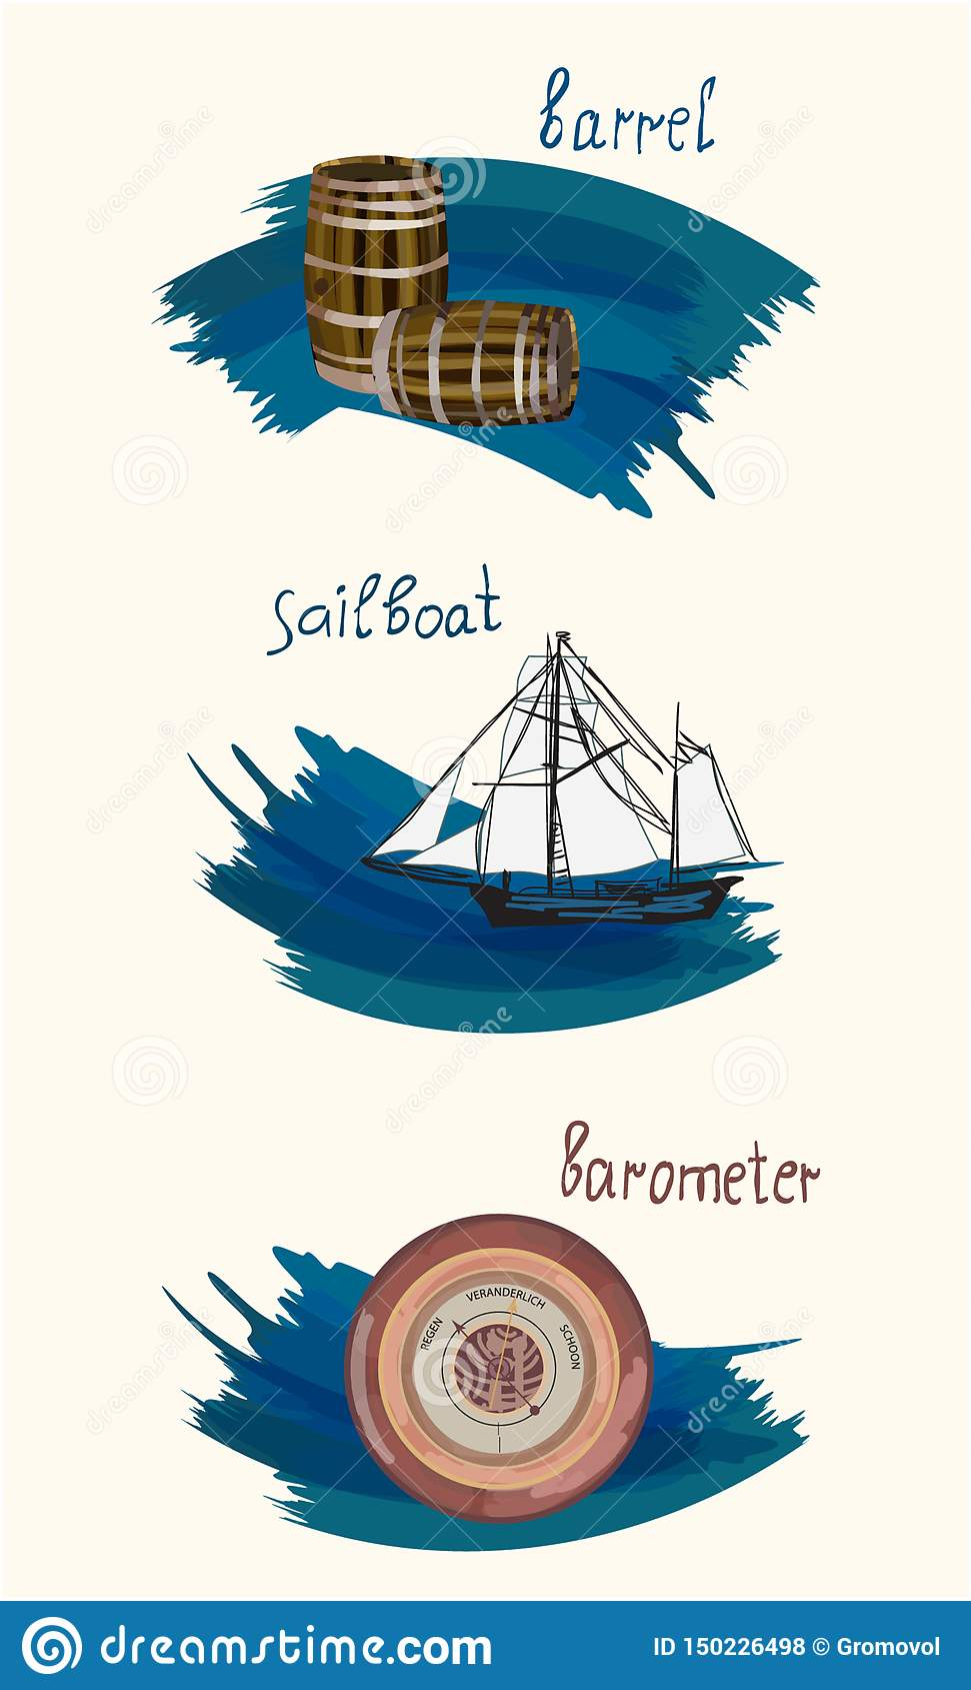 Clipart_old事watercolor_4